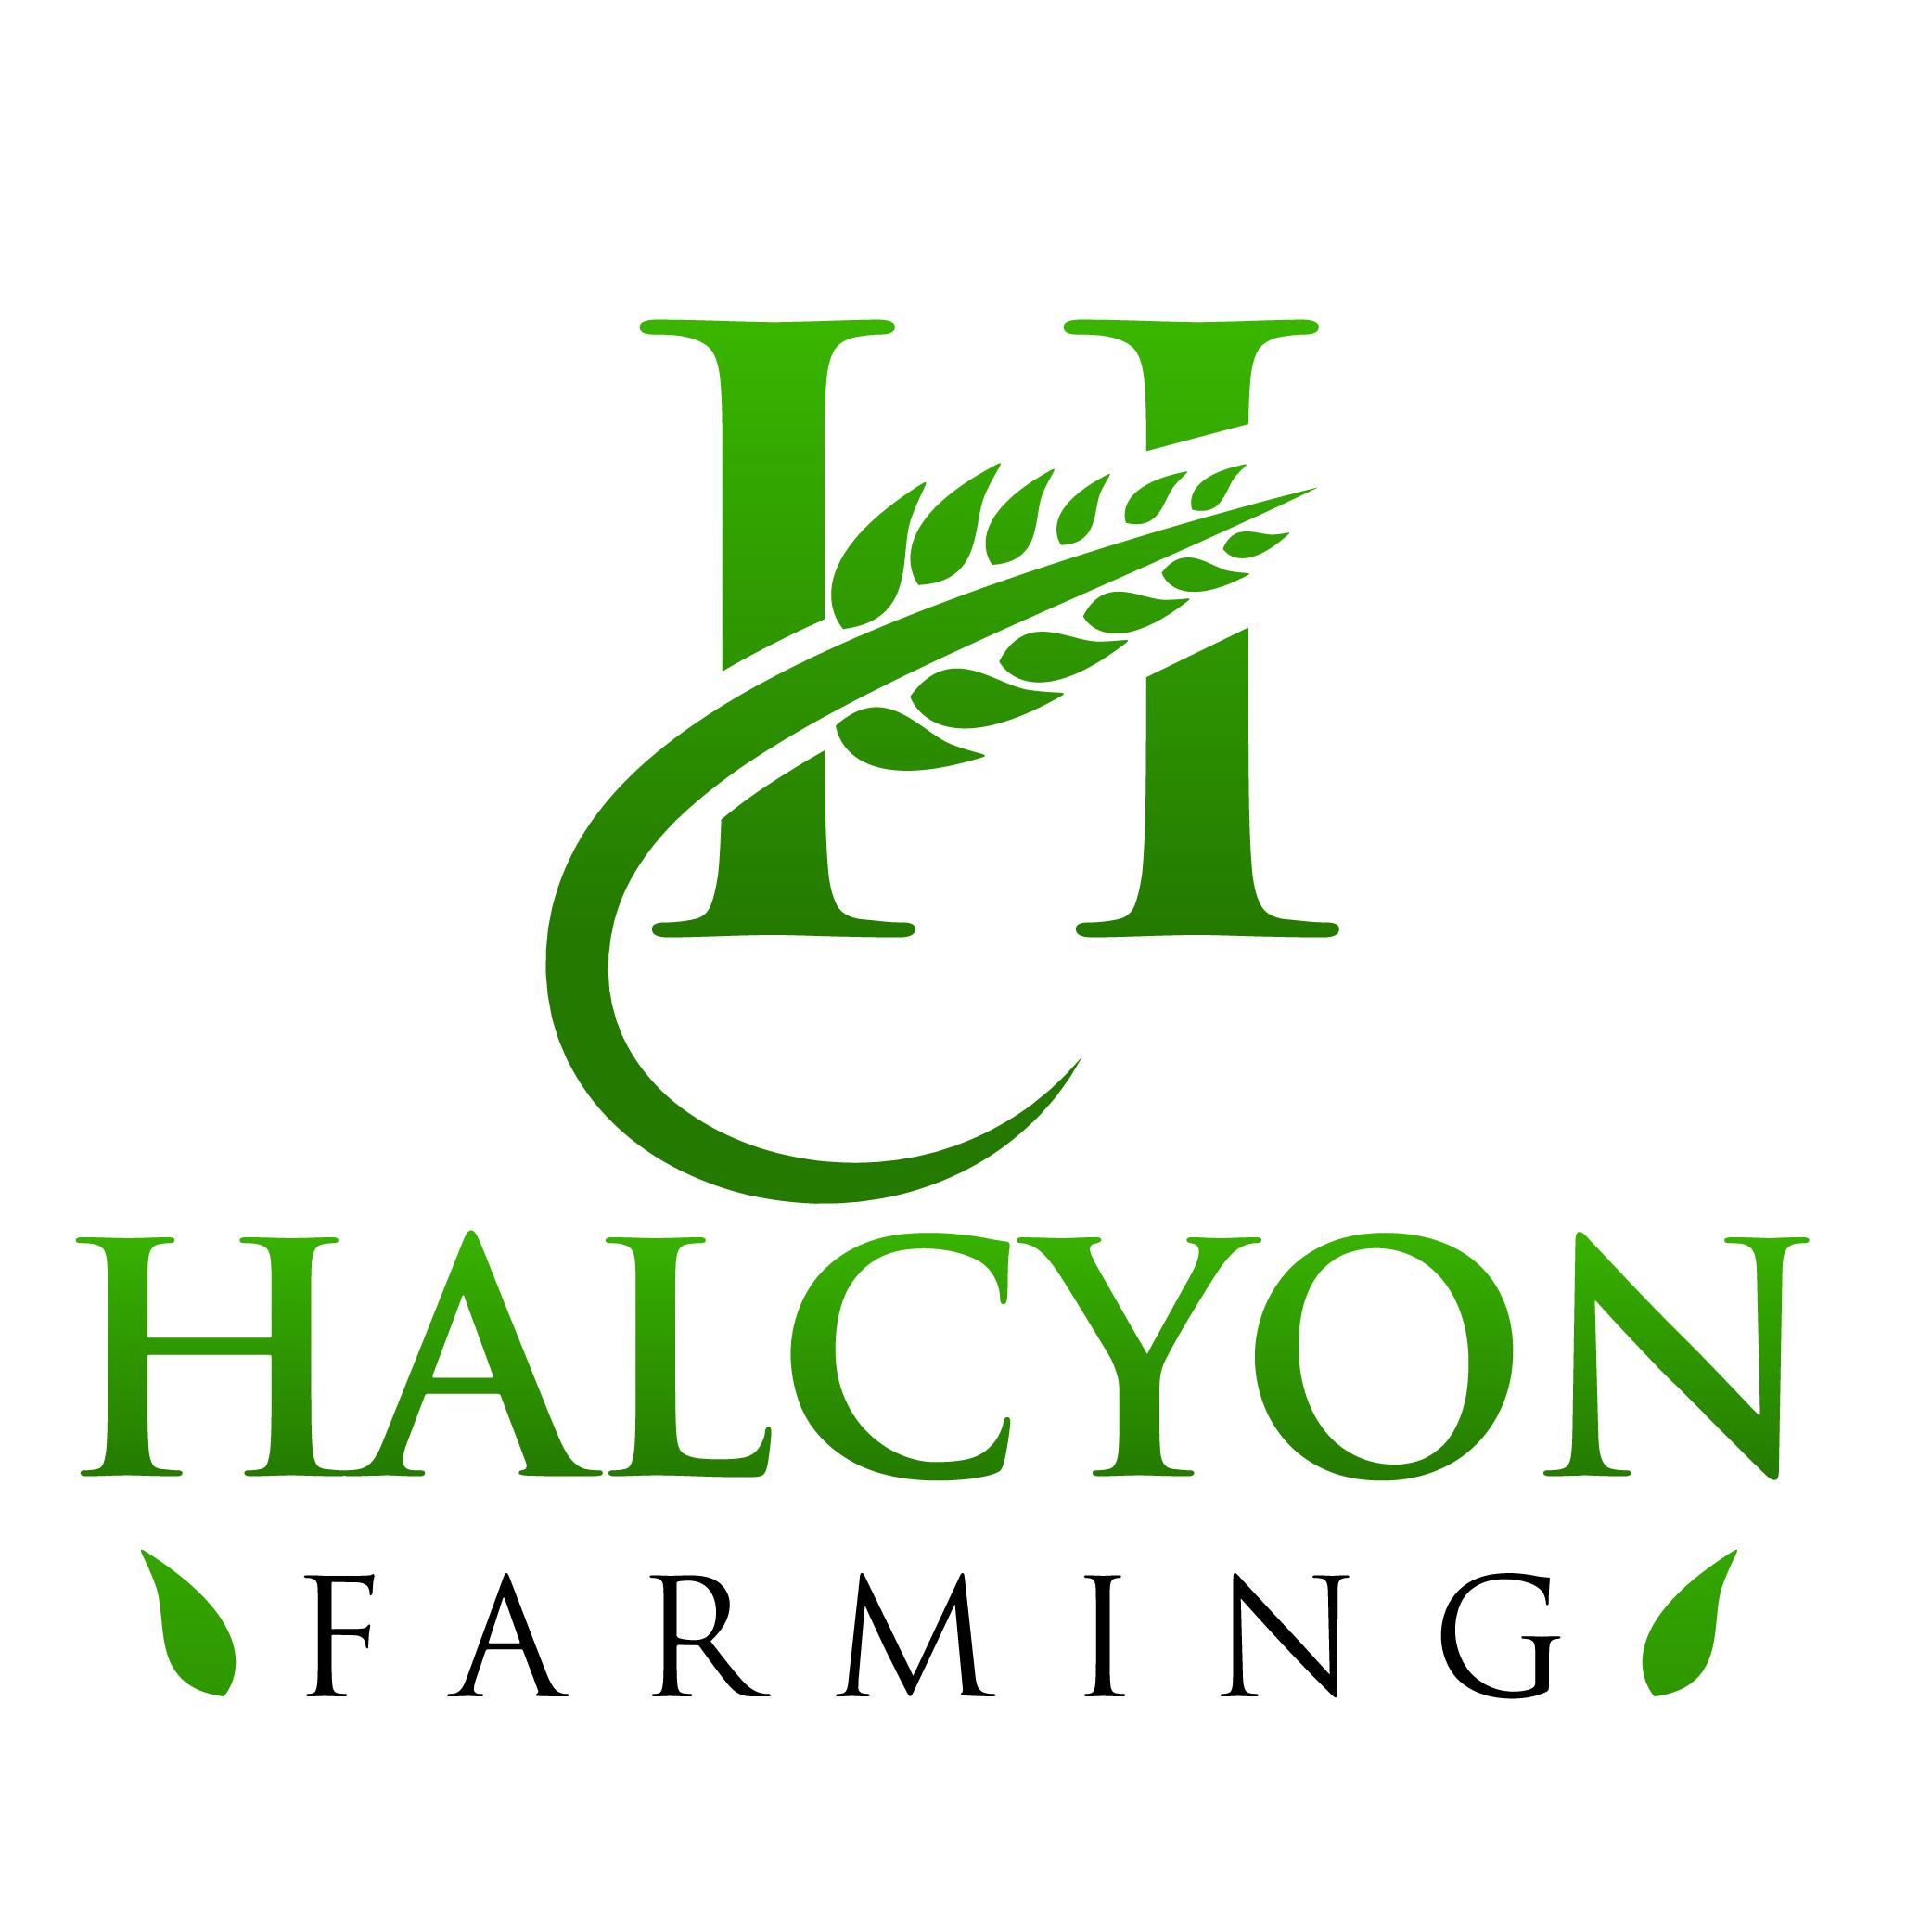 Logo Design by Private User - Entry No. 136 in the Logo Design Contest Creative Logo Design for Halcyon Farming.